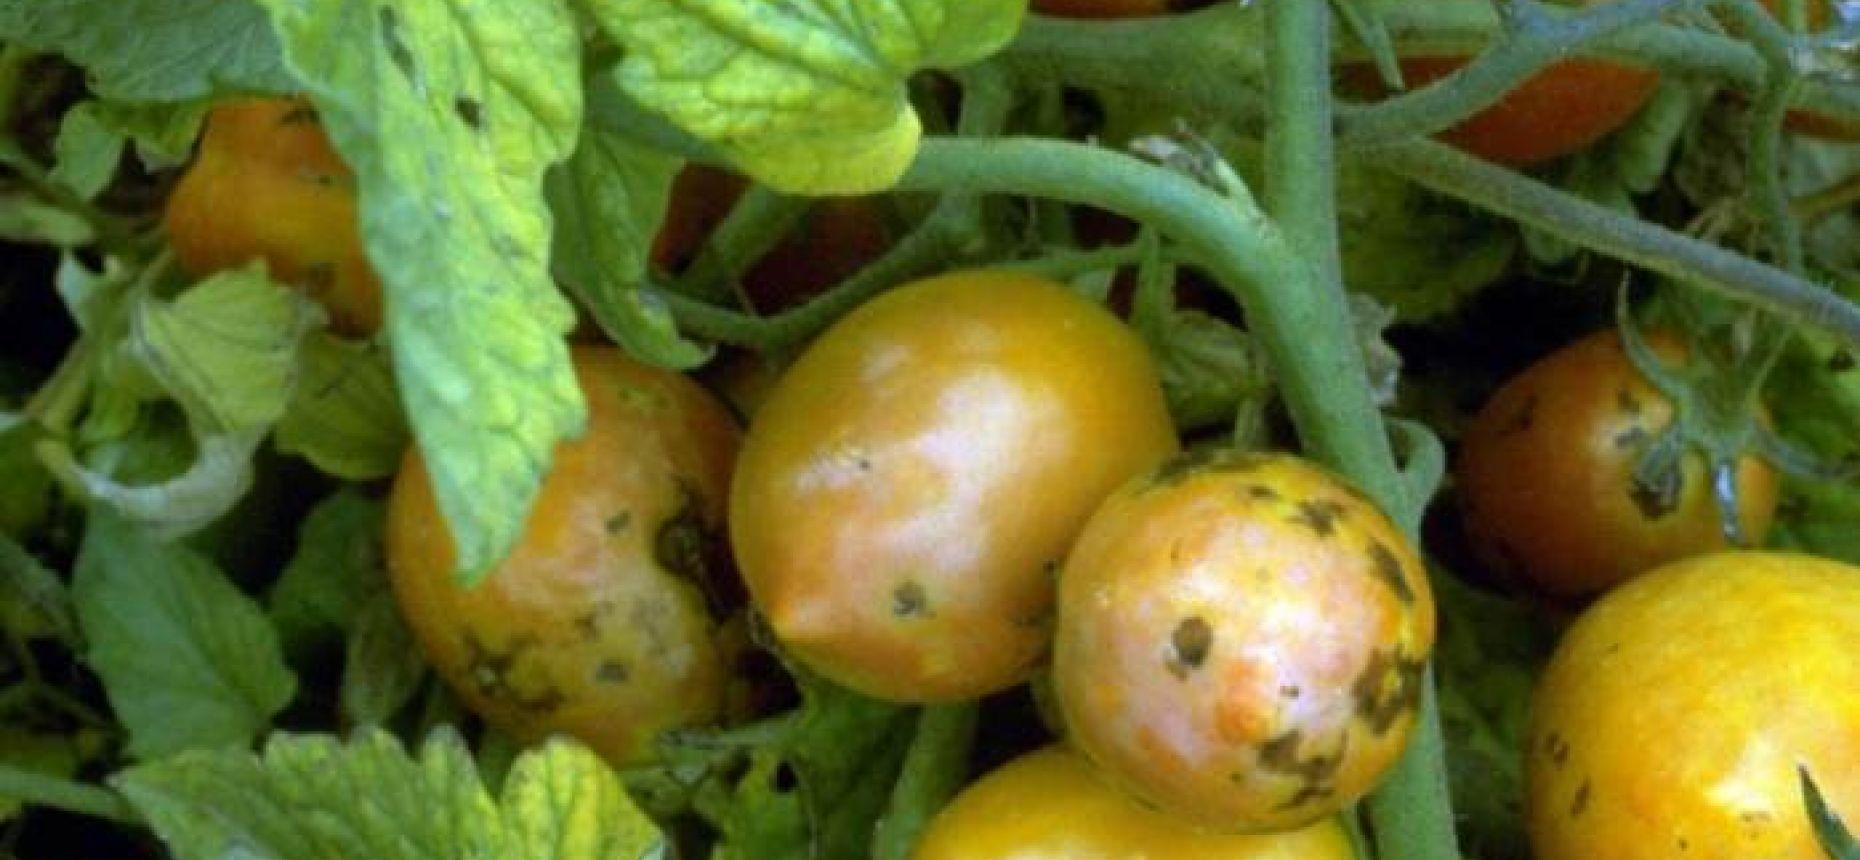 Вирус пятнистого увядания томата - Tomato spotted wilt virus (= Lycopersicum virus 3 Smith)